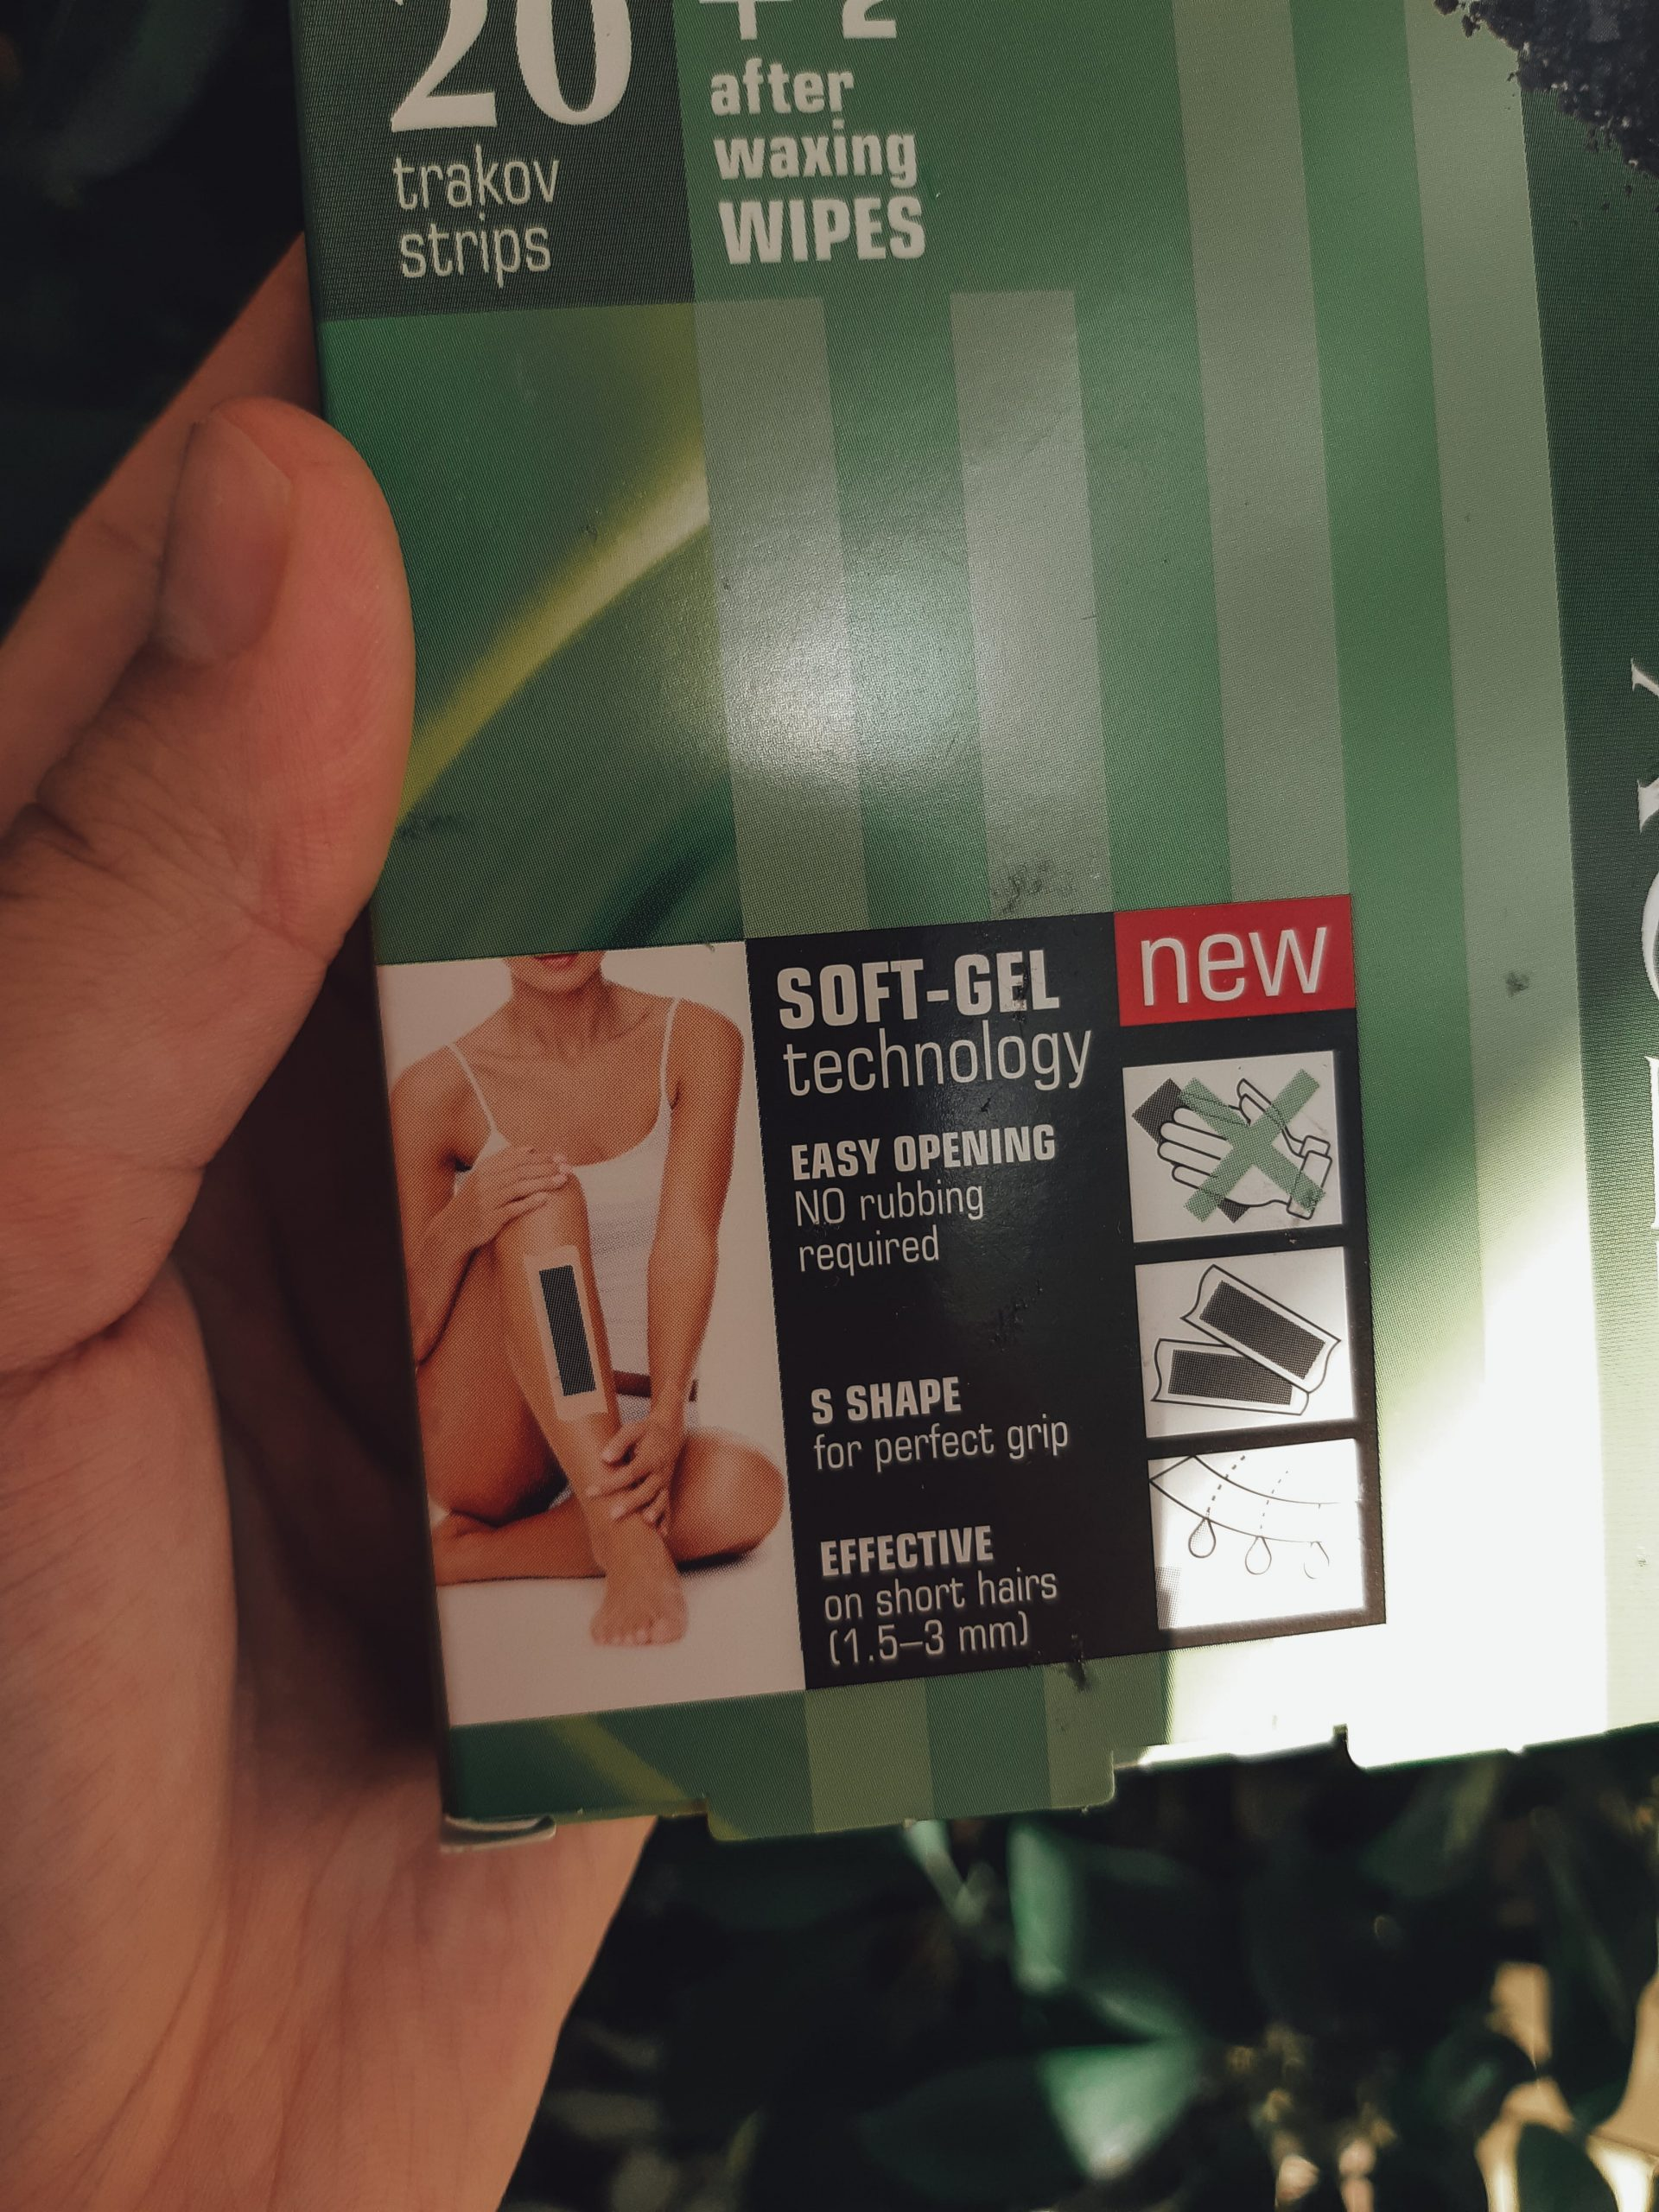 afrodita cosmetics cold wax hair removal strips review recenzija livinglikev fashion blogger afrodita trake za depilaciju recenzija